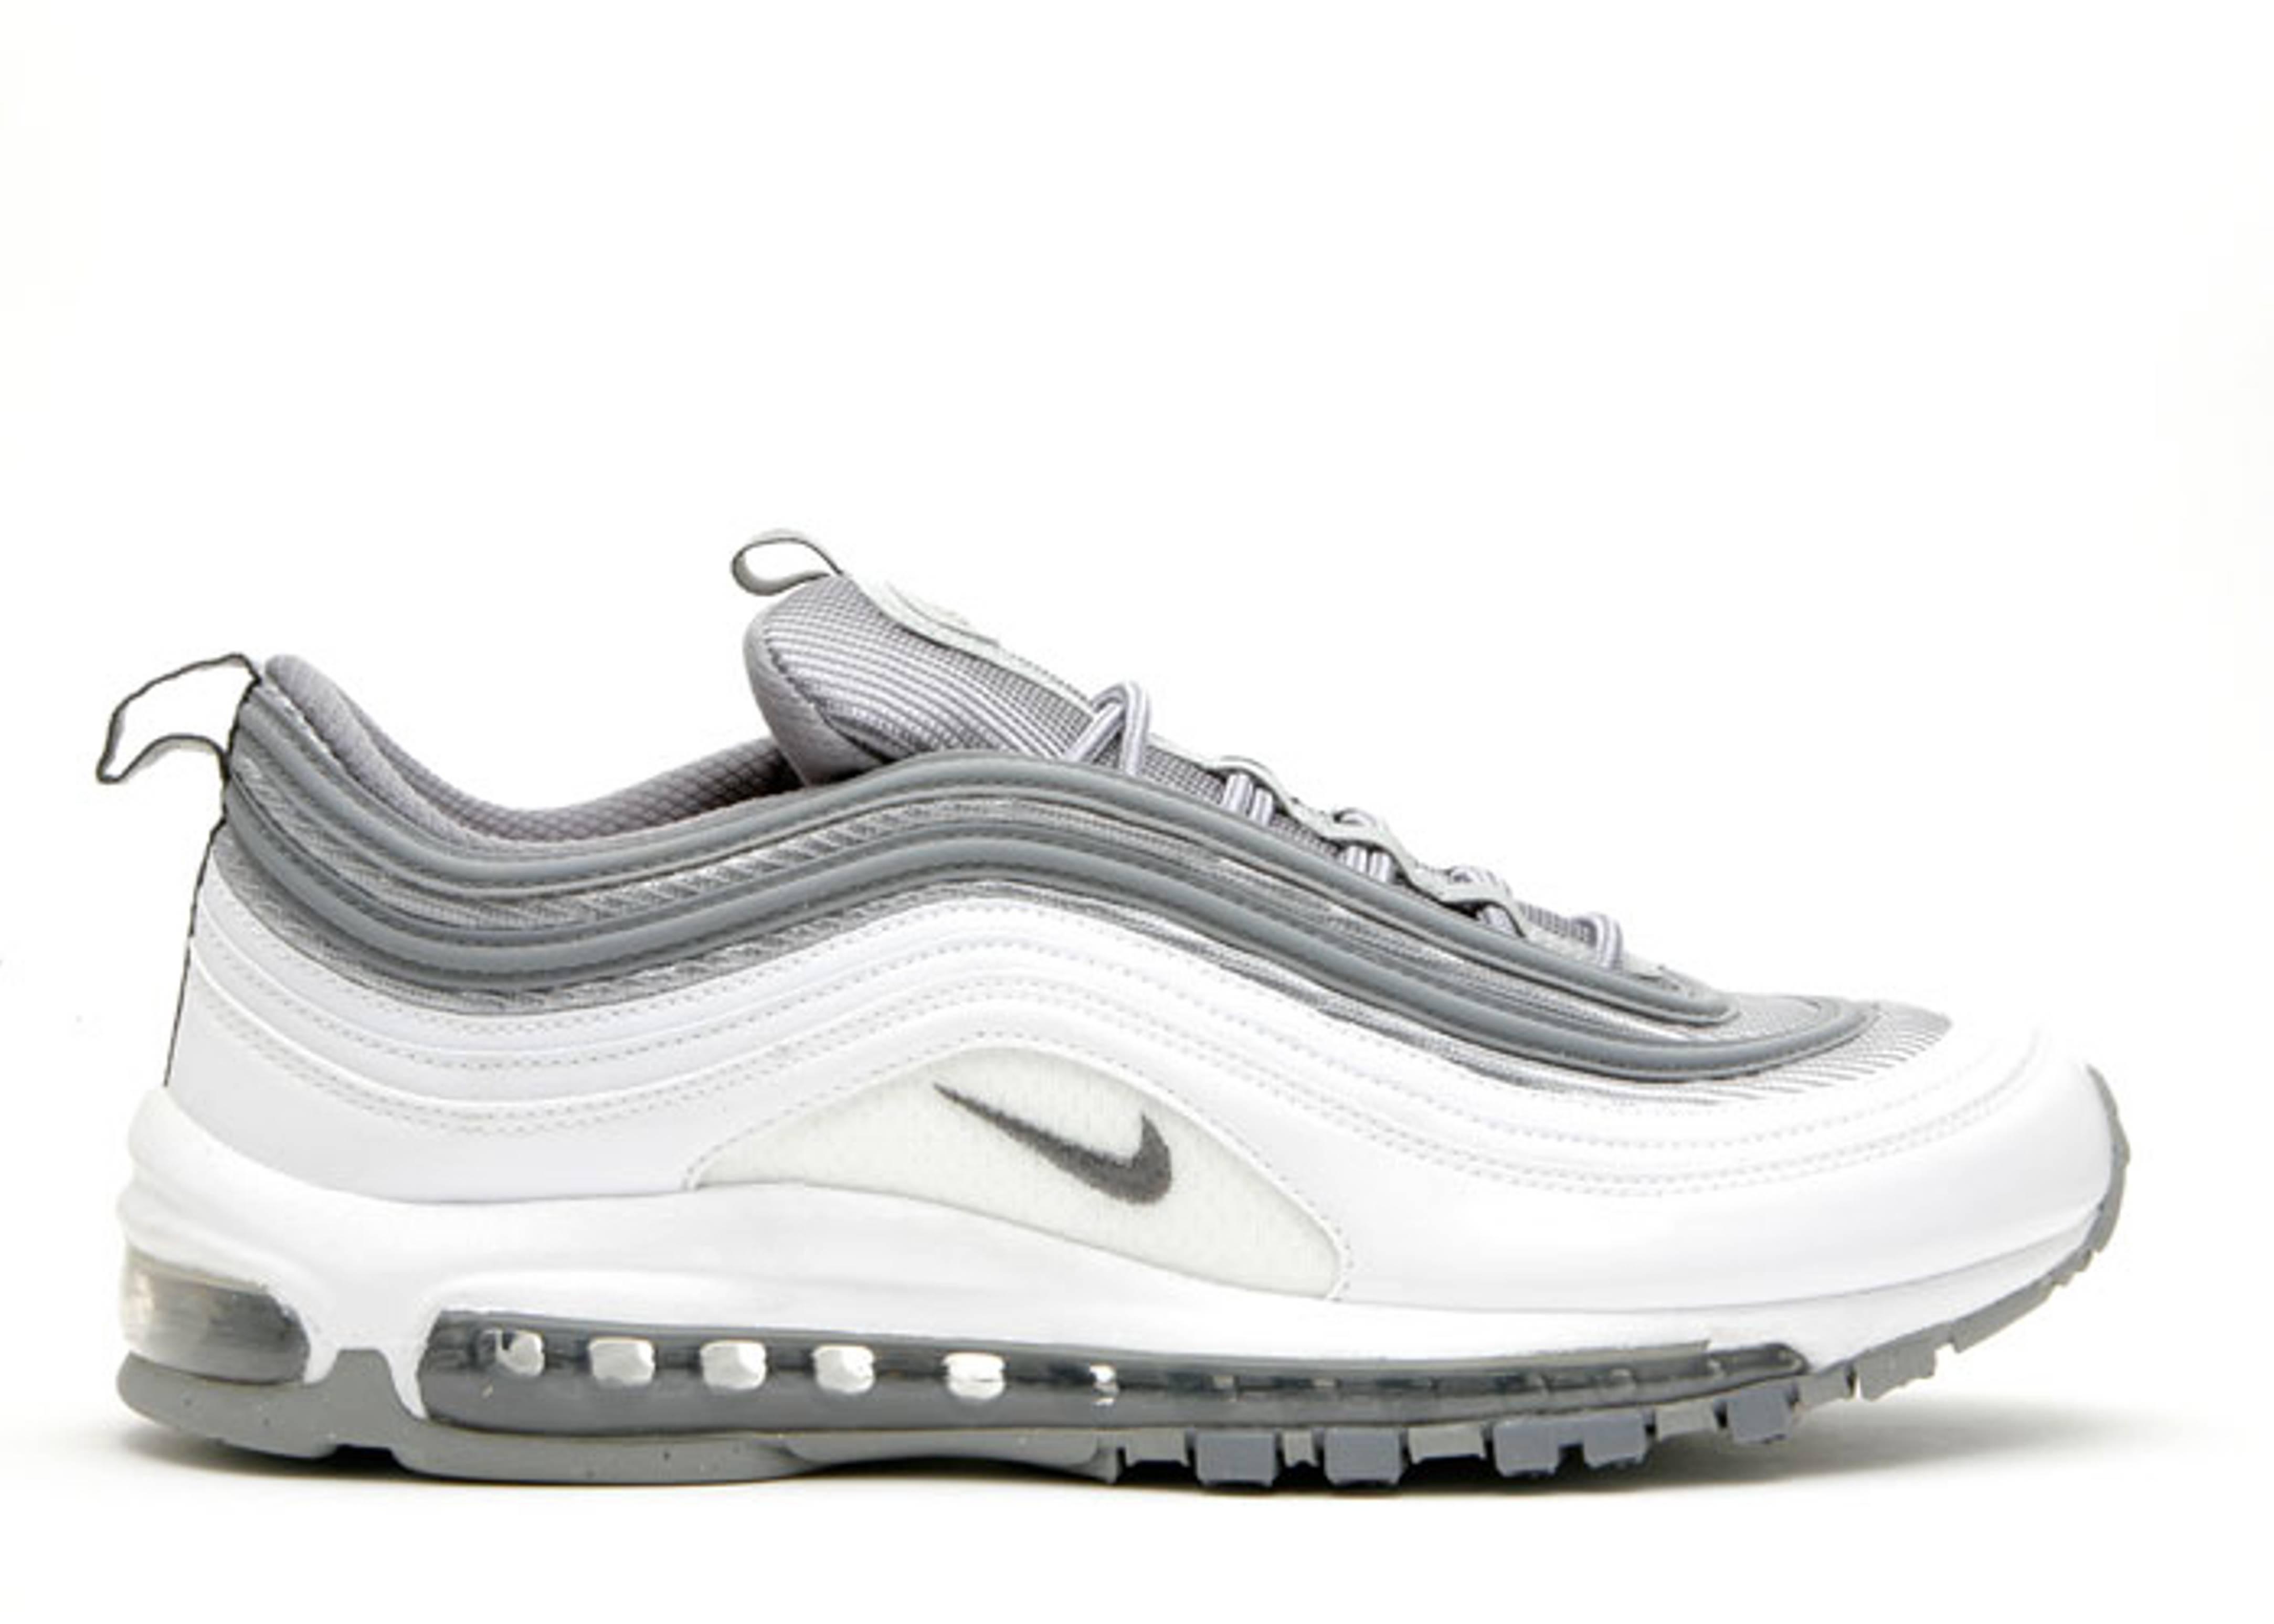 Nike Air Max 97 Shadow Grey